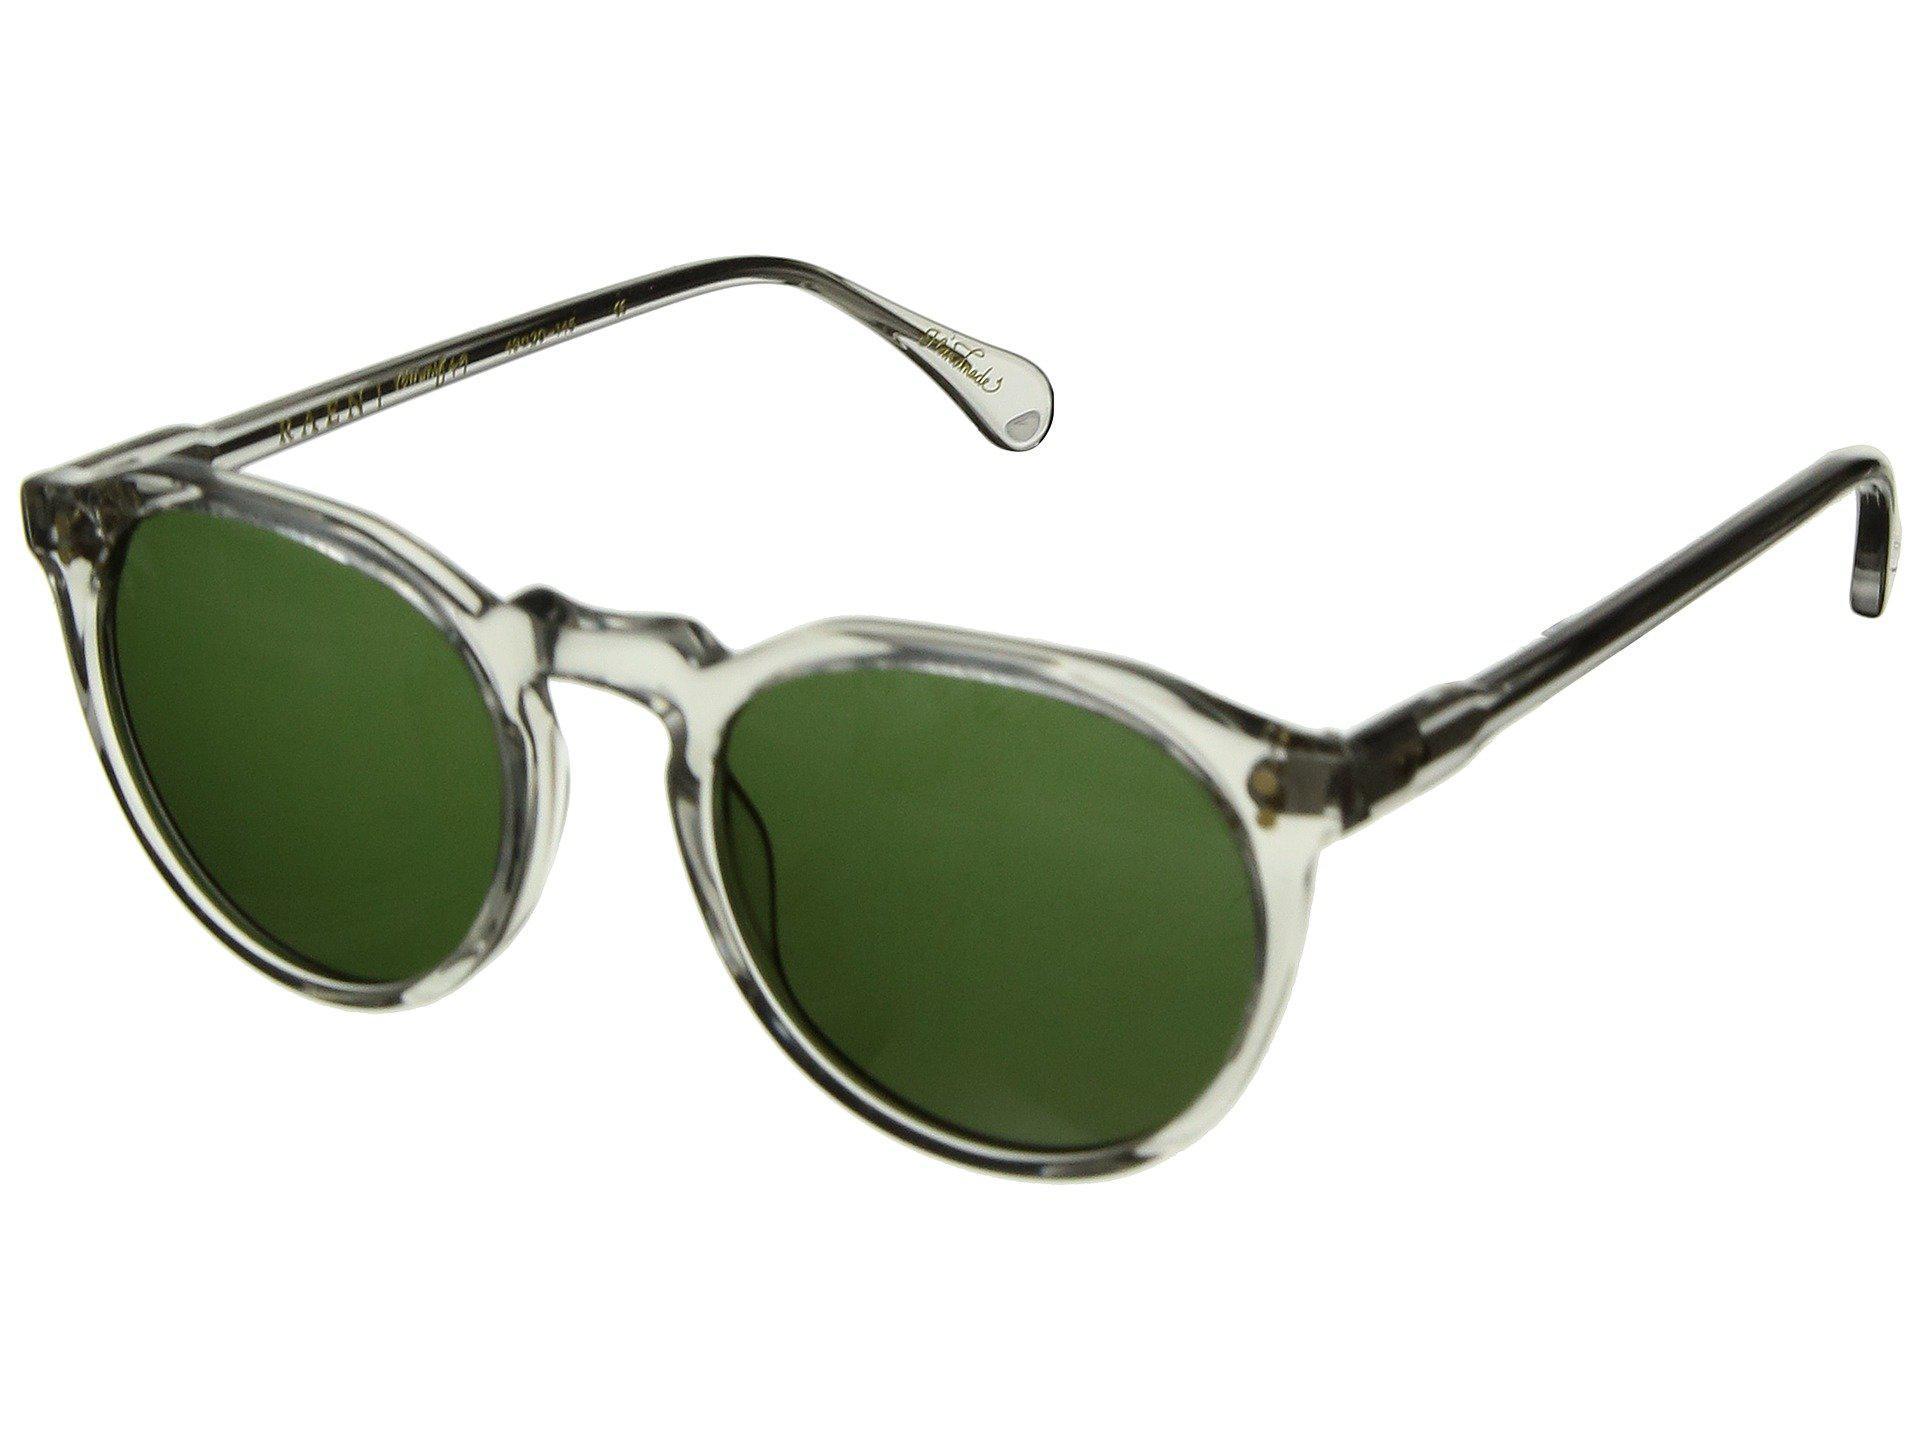 8e2f71071d05 Lyst - Raen Remmy 49 (matte Ash acid Brown) Sport Sunglasses in Green